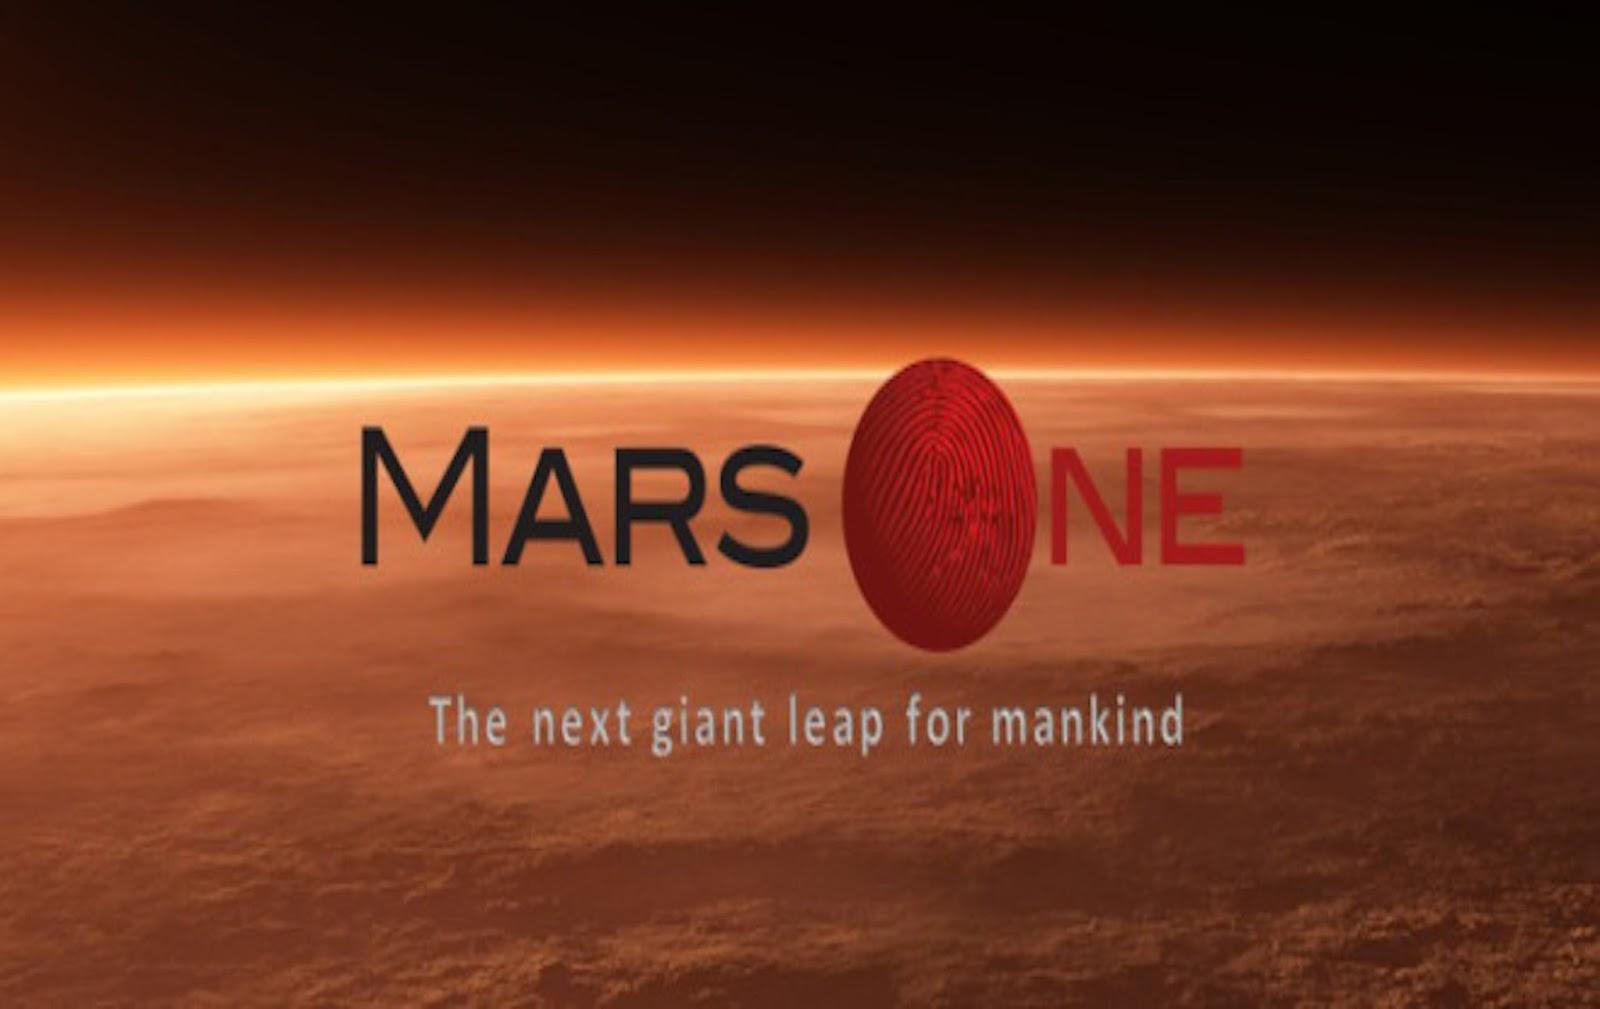 mars one application deadline - photo #15